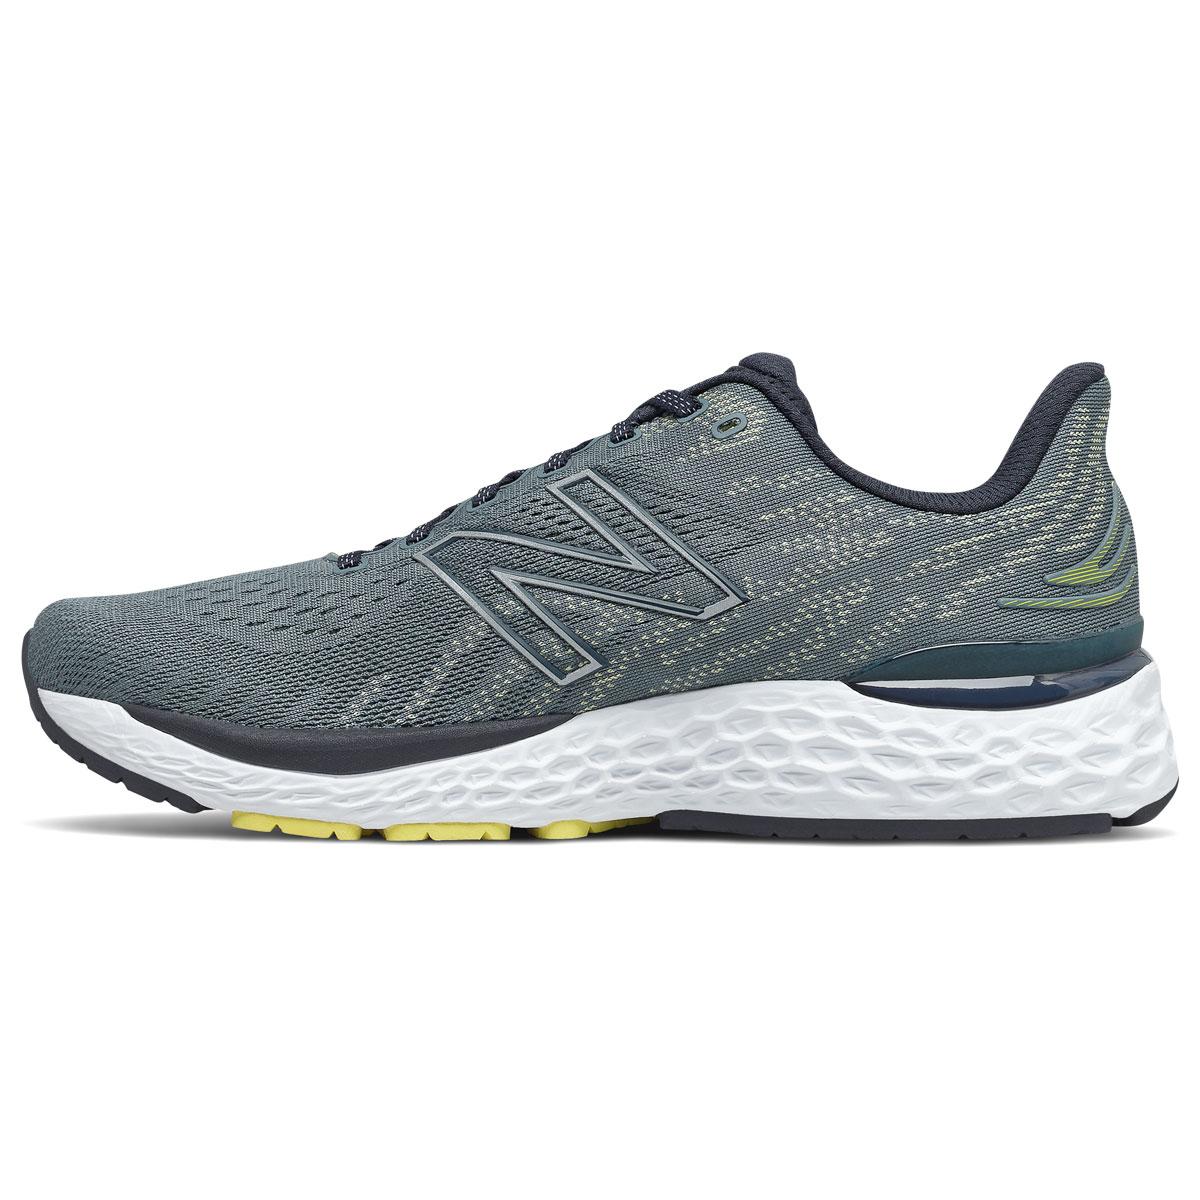 Men's New Balance Fresh Foam 880v11 Running Shoe - Color: Ocean Grey/First Light - Size: 7 - Width: Wide, Ocean Grey/First Light, large, image 2